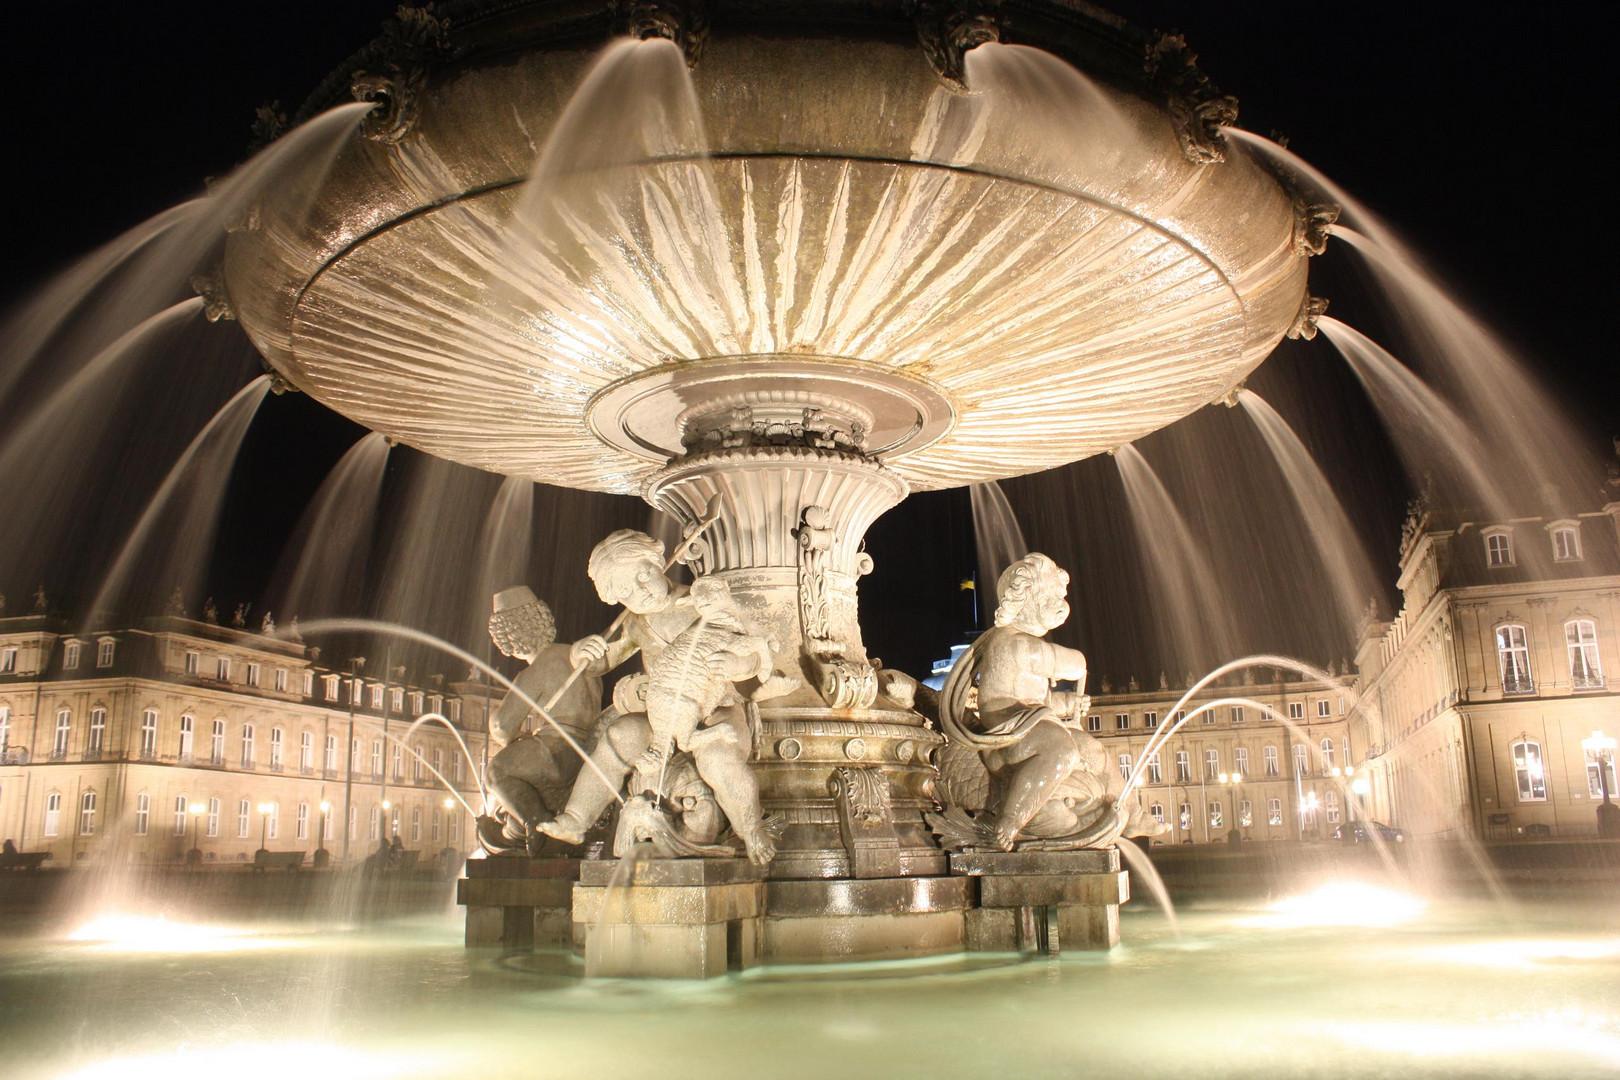 Suttgart, Schlossplatz Brunnen